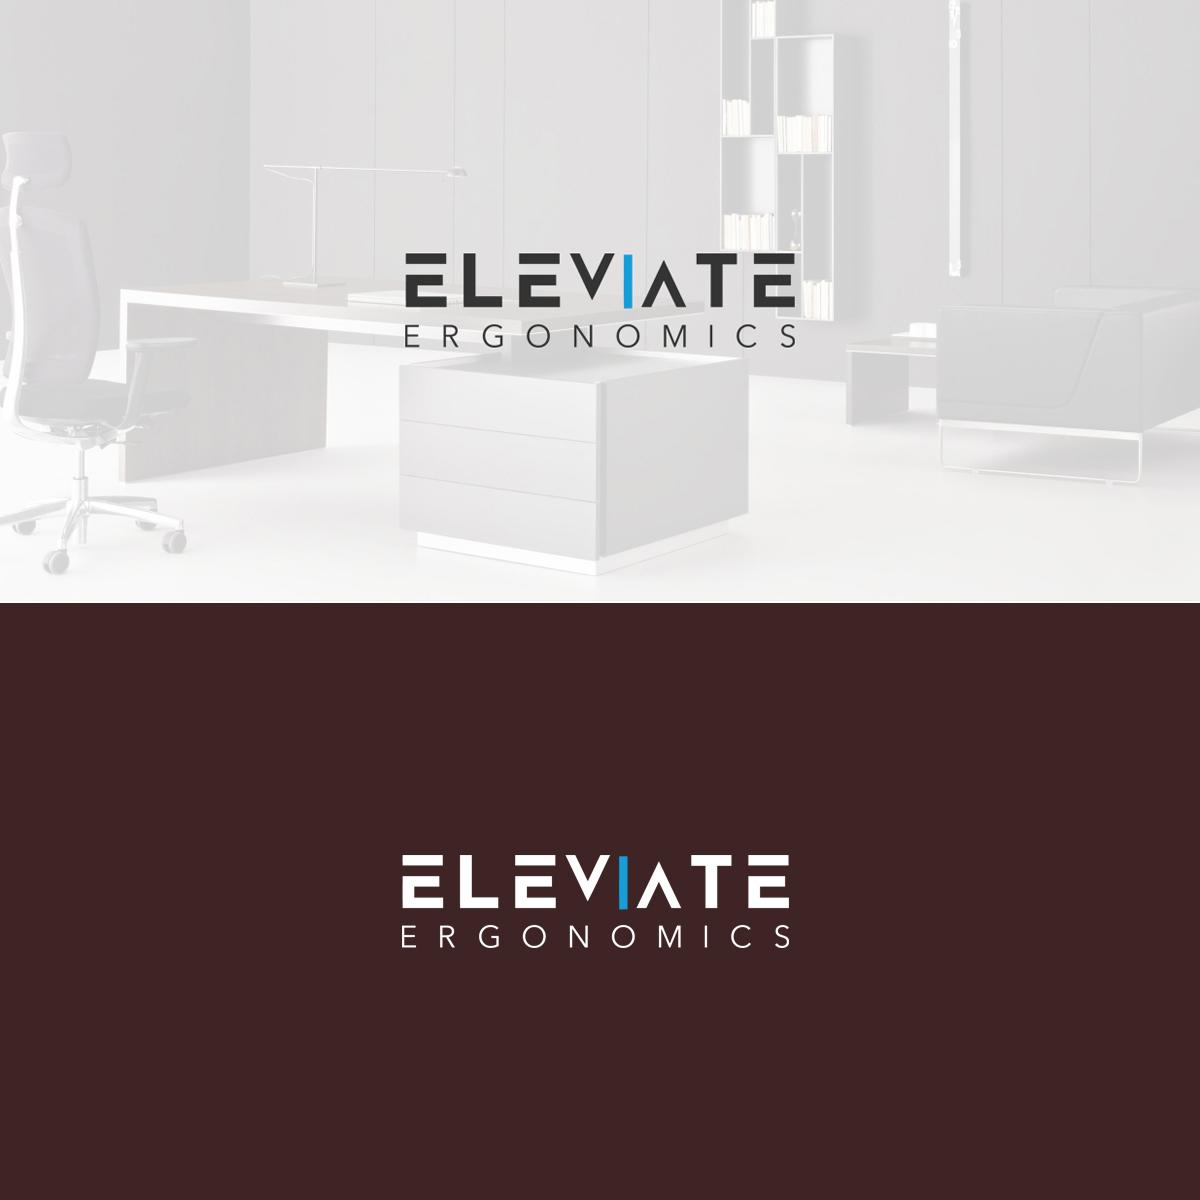 Logo Design By Kreativekrowd For Elevate Ergonomics 14946643